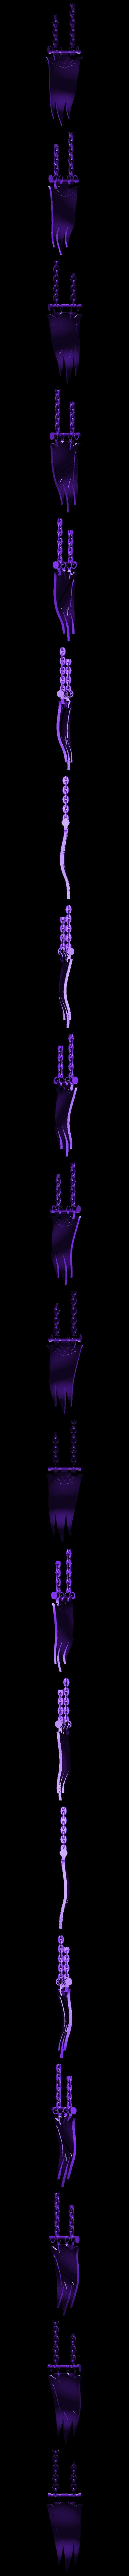 FLAG_2.stl Download free STL file FLAG - MEGA PACK FOR IMPERIAL GUNS • 3D printer template, yaemhay